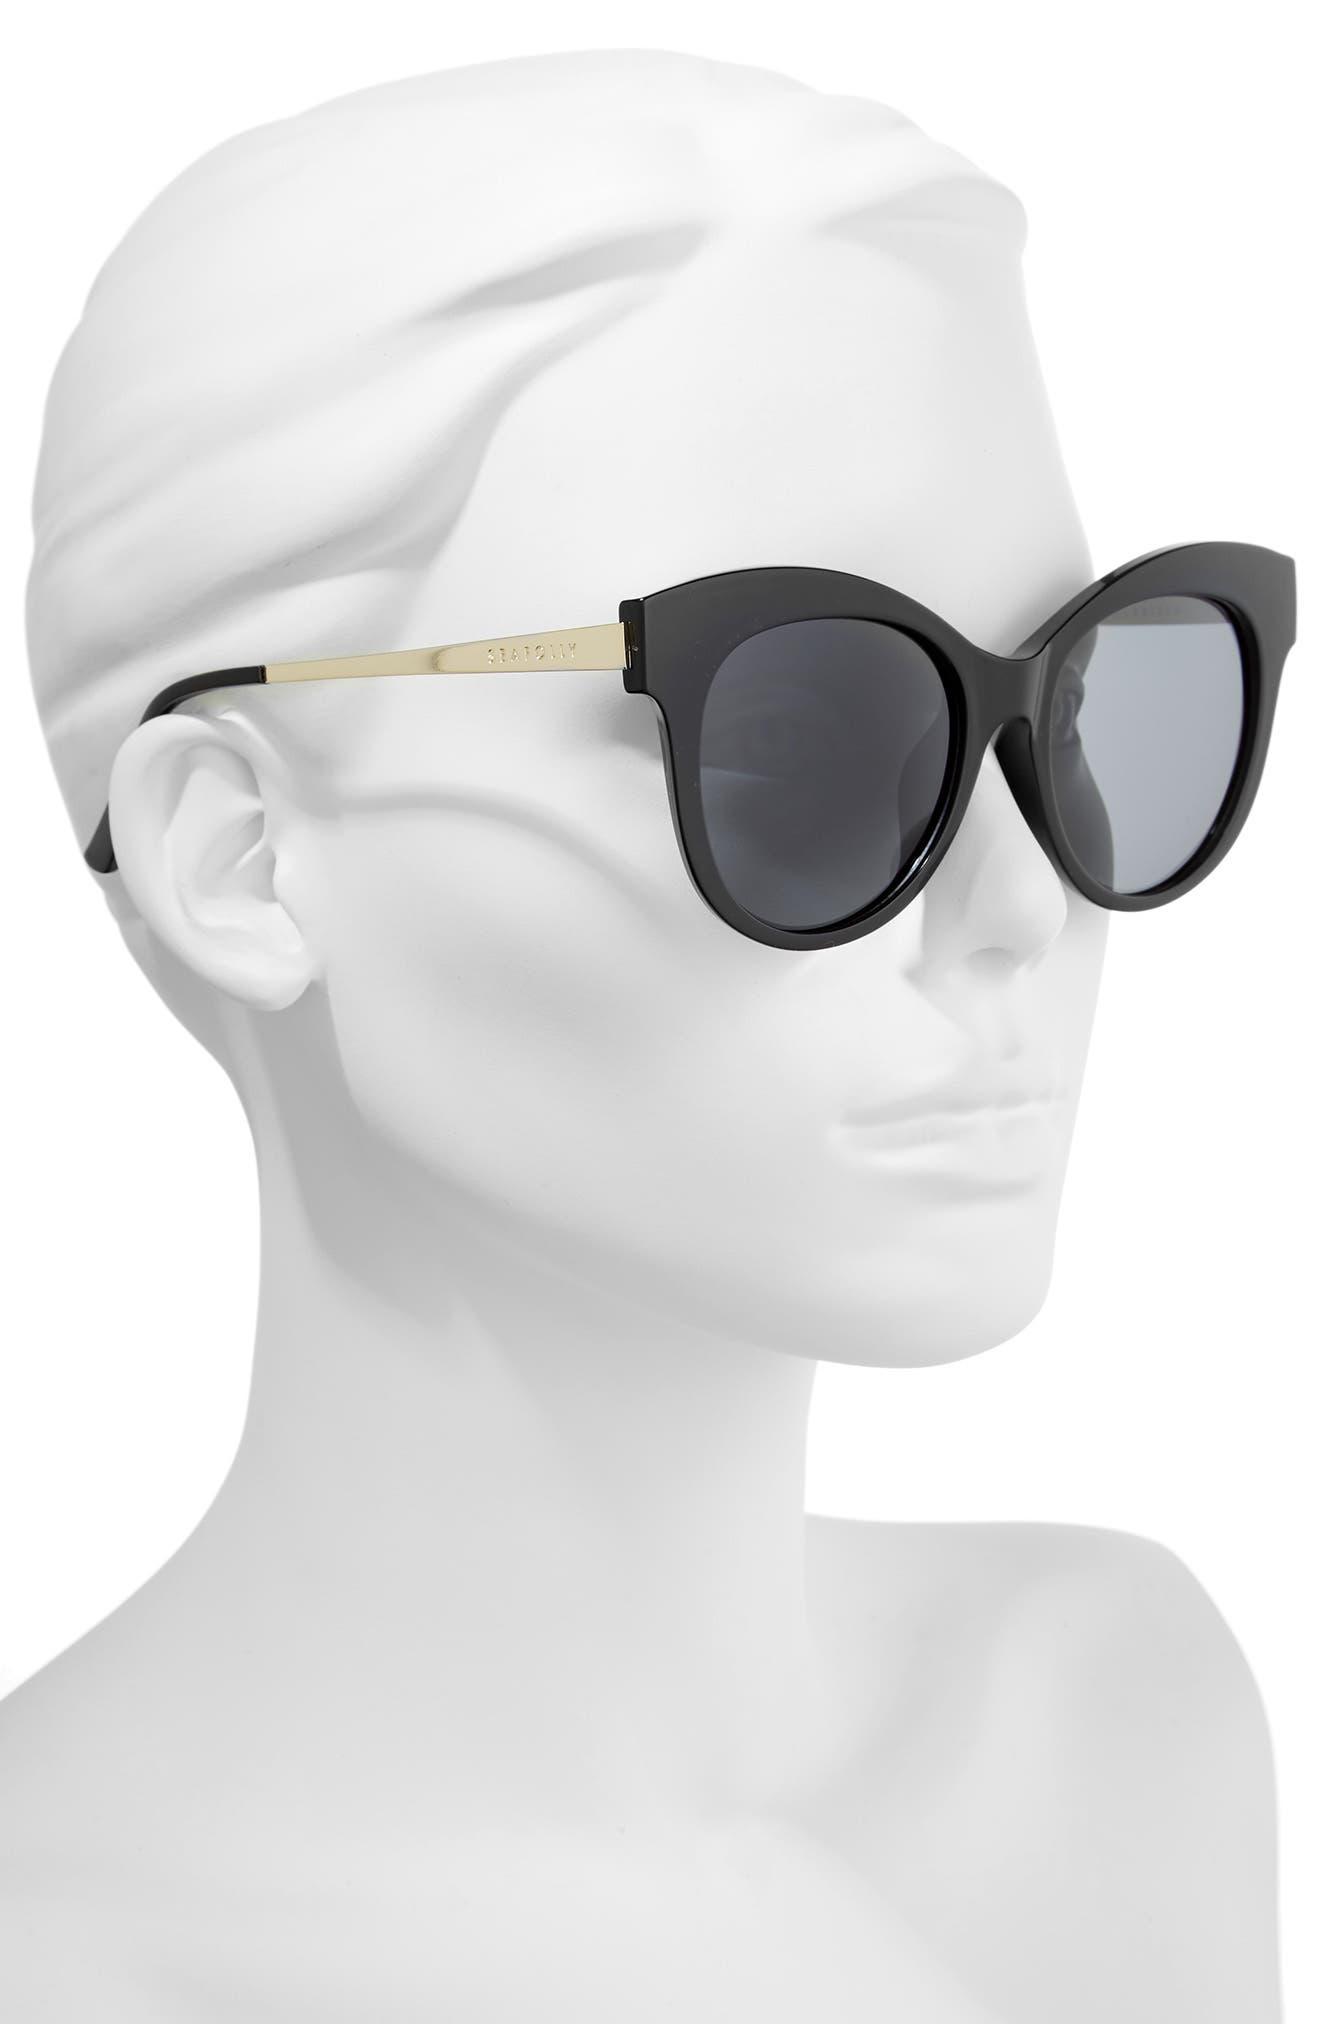 Hayman 53mm Cat Eye Sunglasses,                             Alternate thumbnail 2, color,                             BLACK